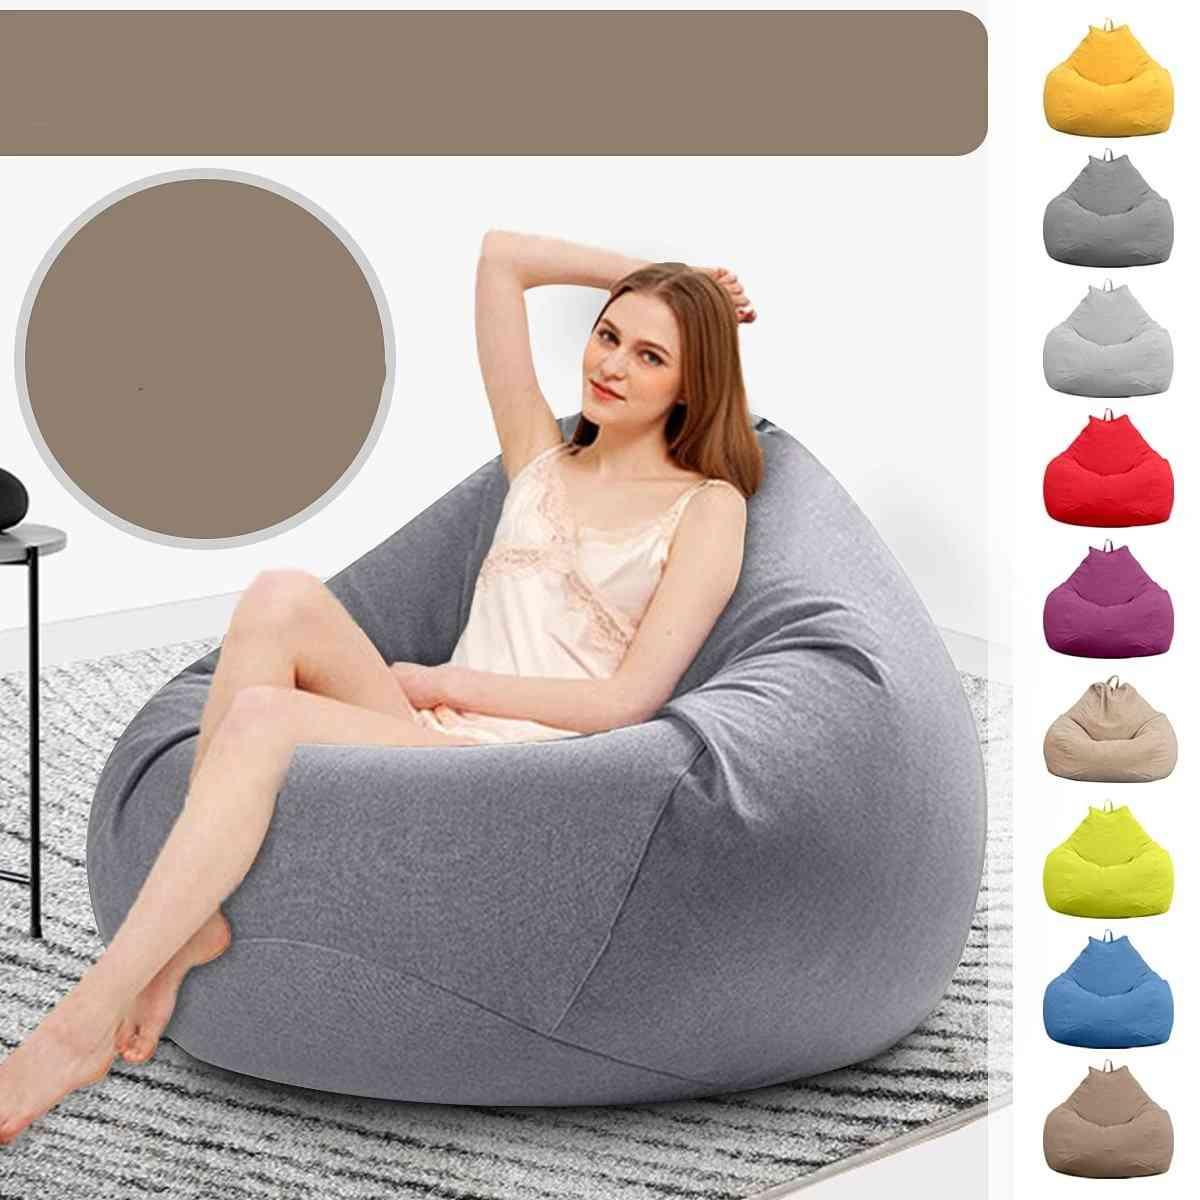 Large & Small- Lazy Bean-bag Sofas